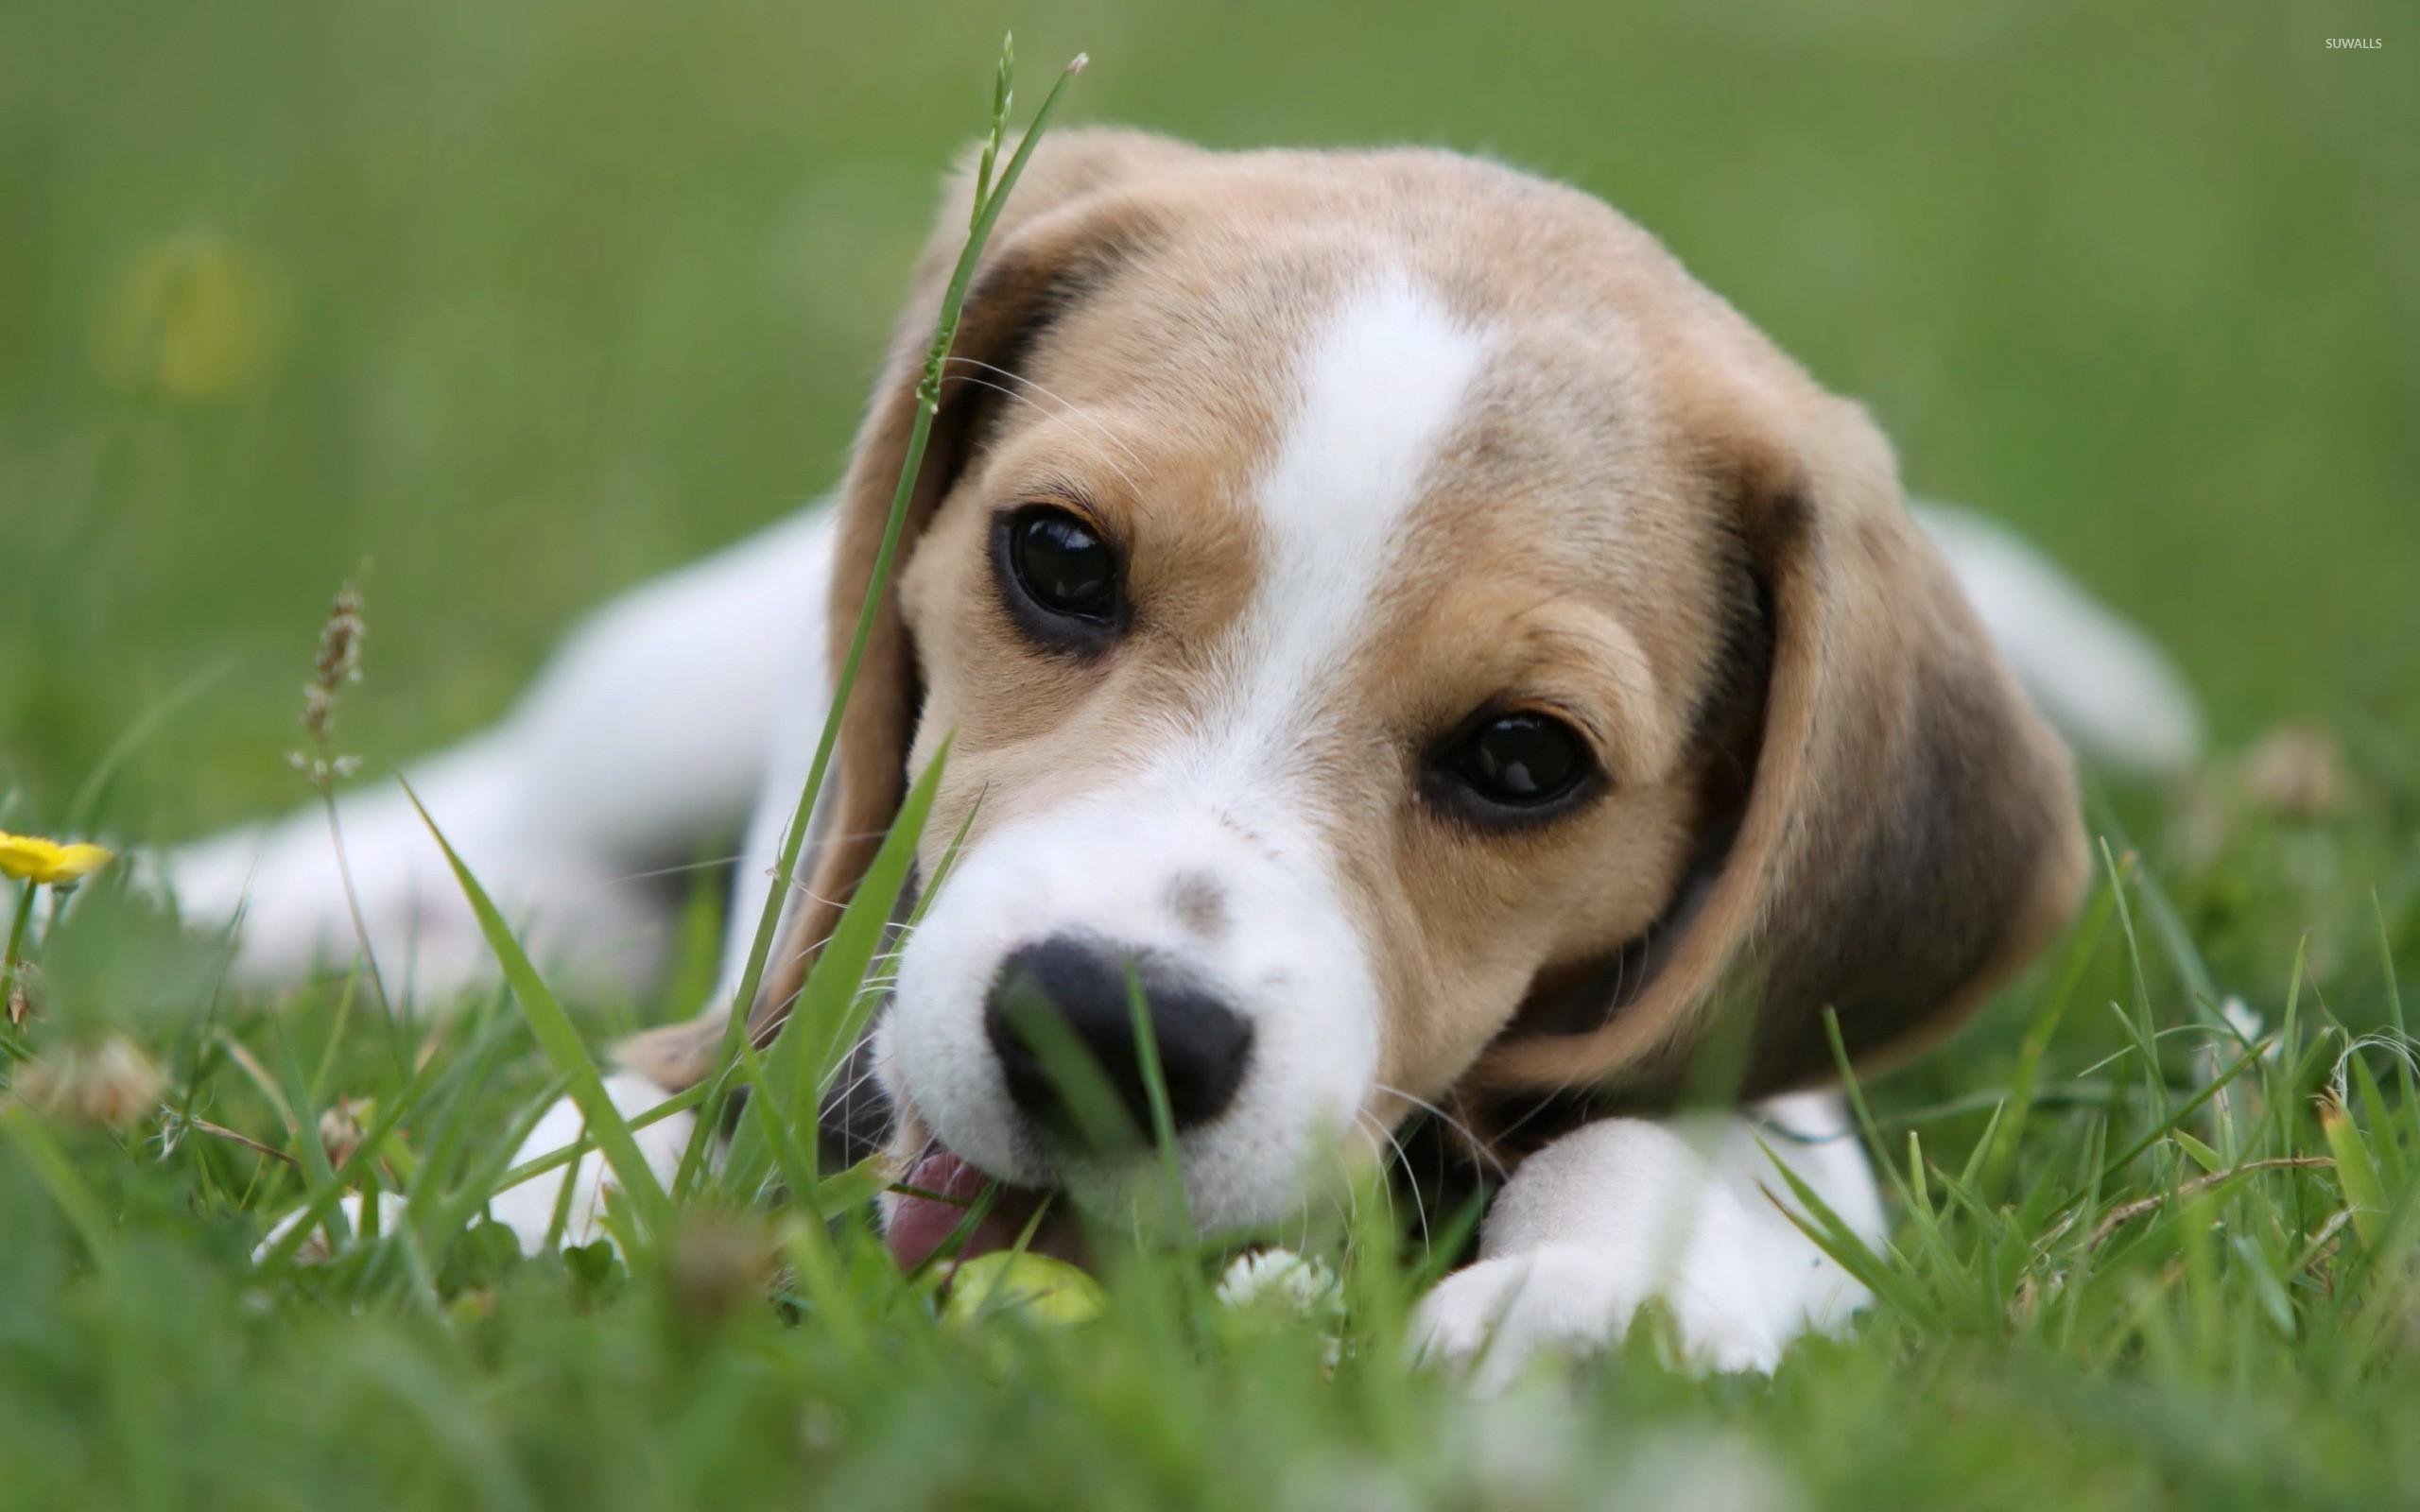 Beagle puppy 2 wallpaper animal wallpapers 21619